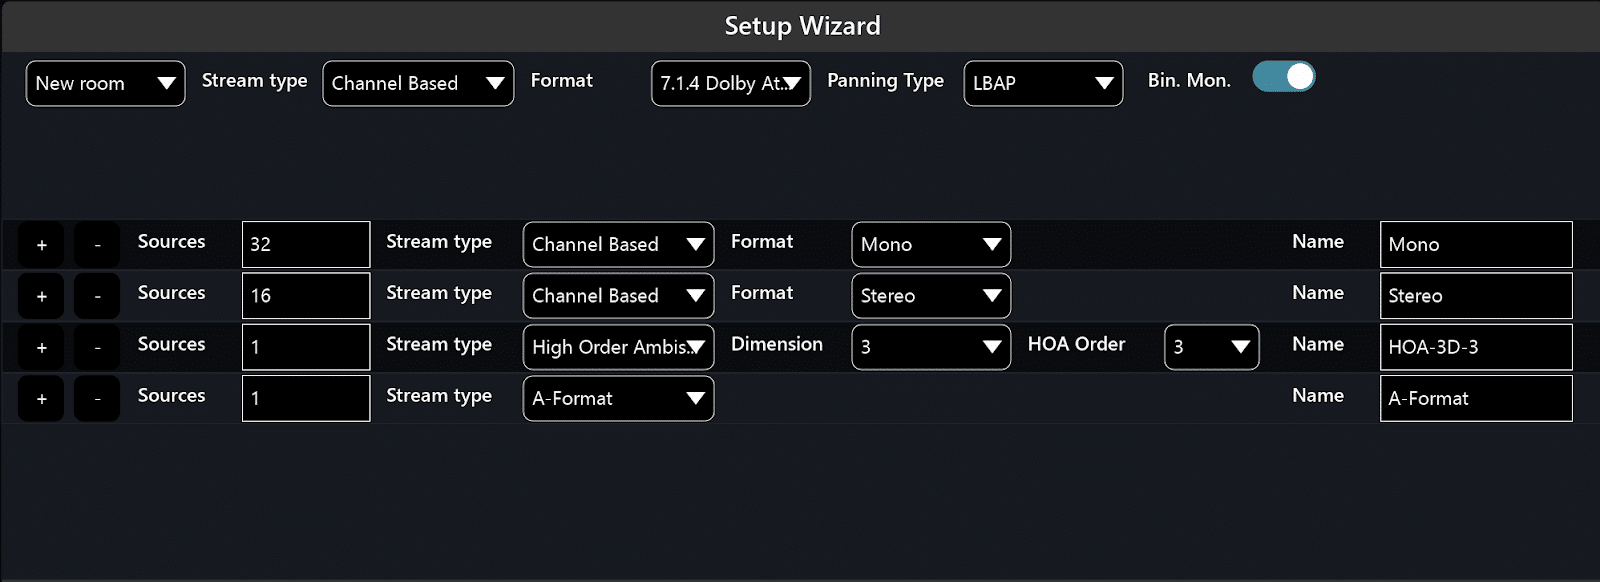 Setup Wizardry